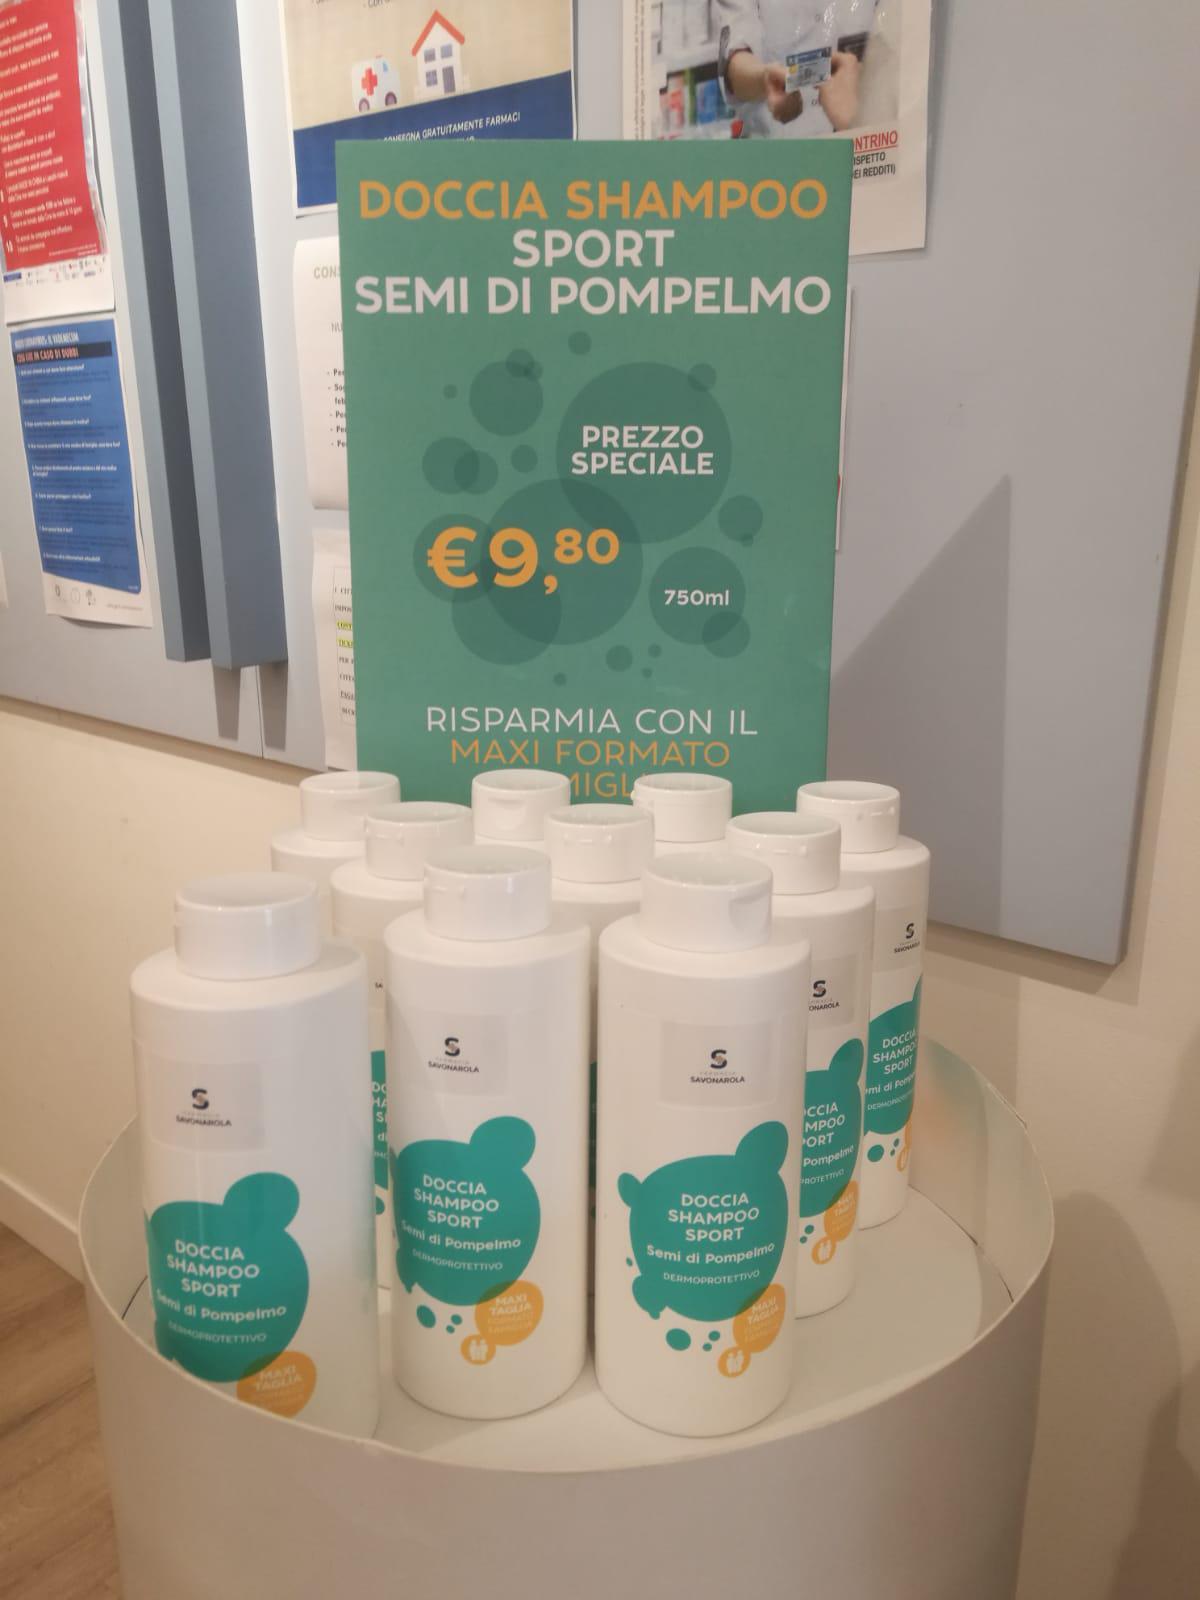 Doccia Shampoo Sport